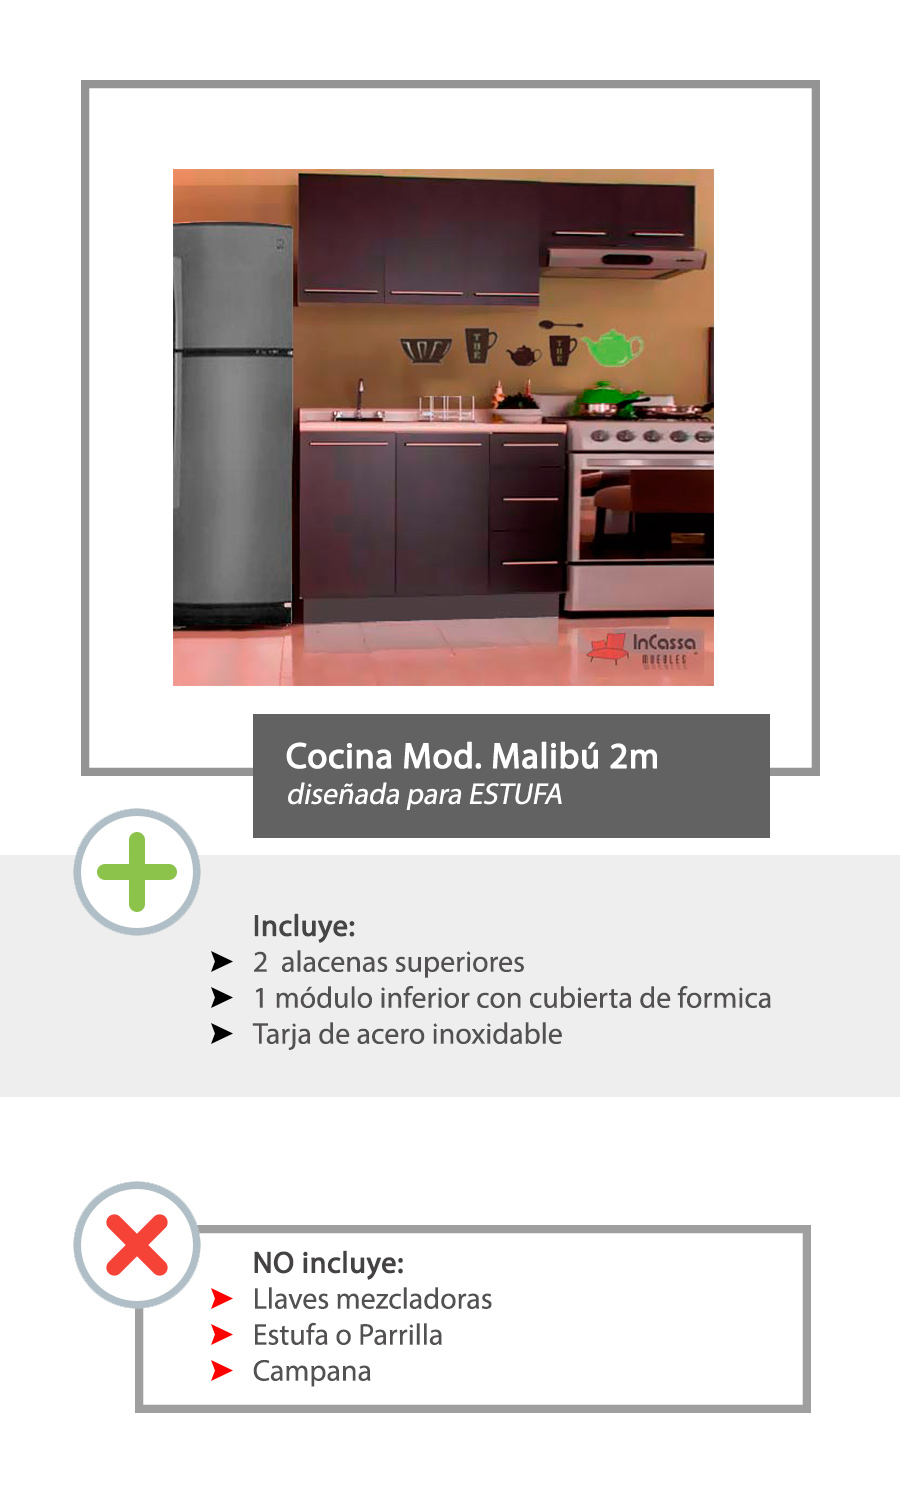 Cocina integral minimalista 2m gabinetes alacenas cubierta for Gabinetes cocina integral